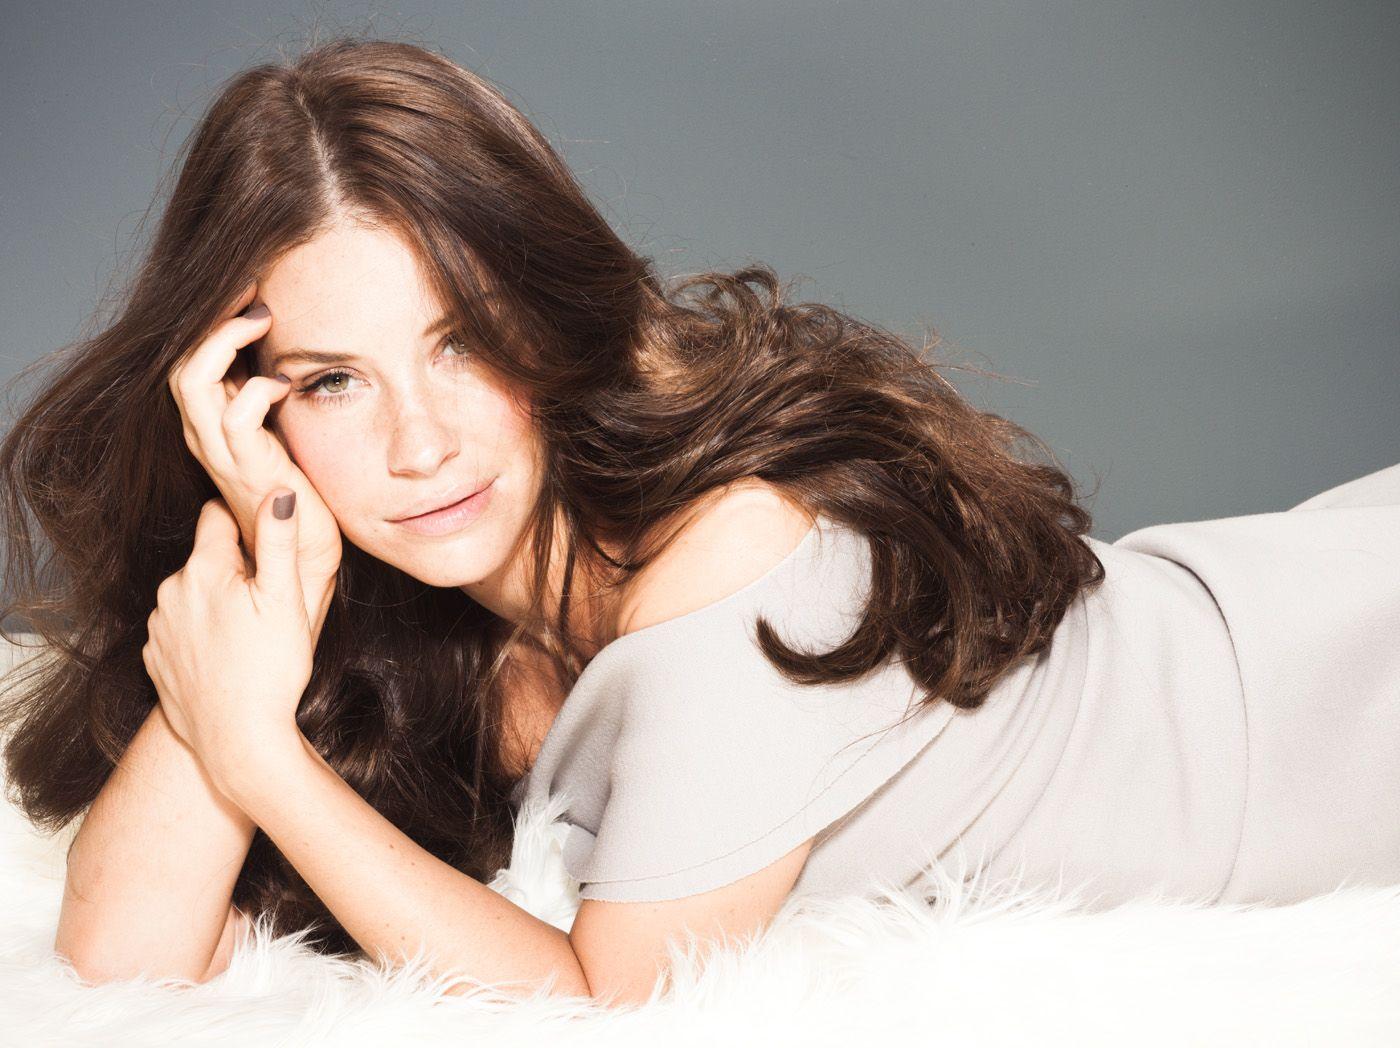 Evangeline Lilly desktop wallpaper free download in